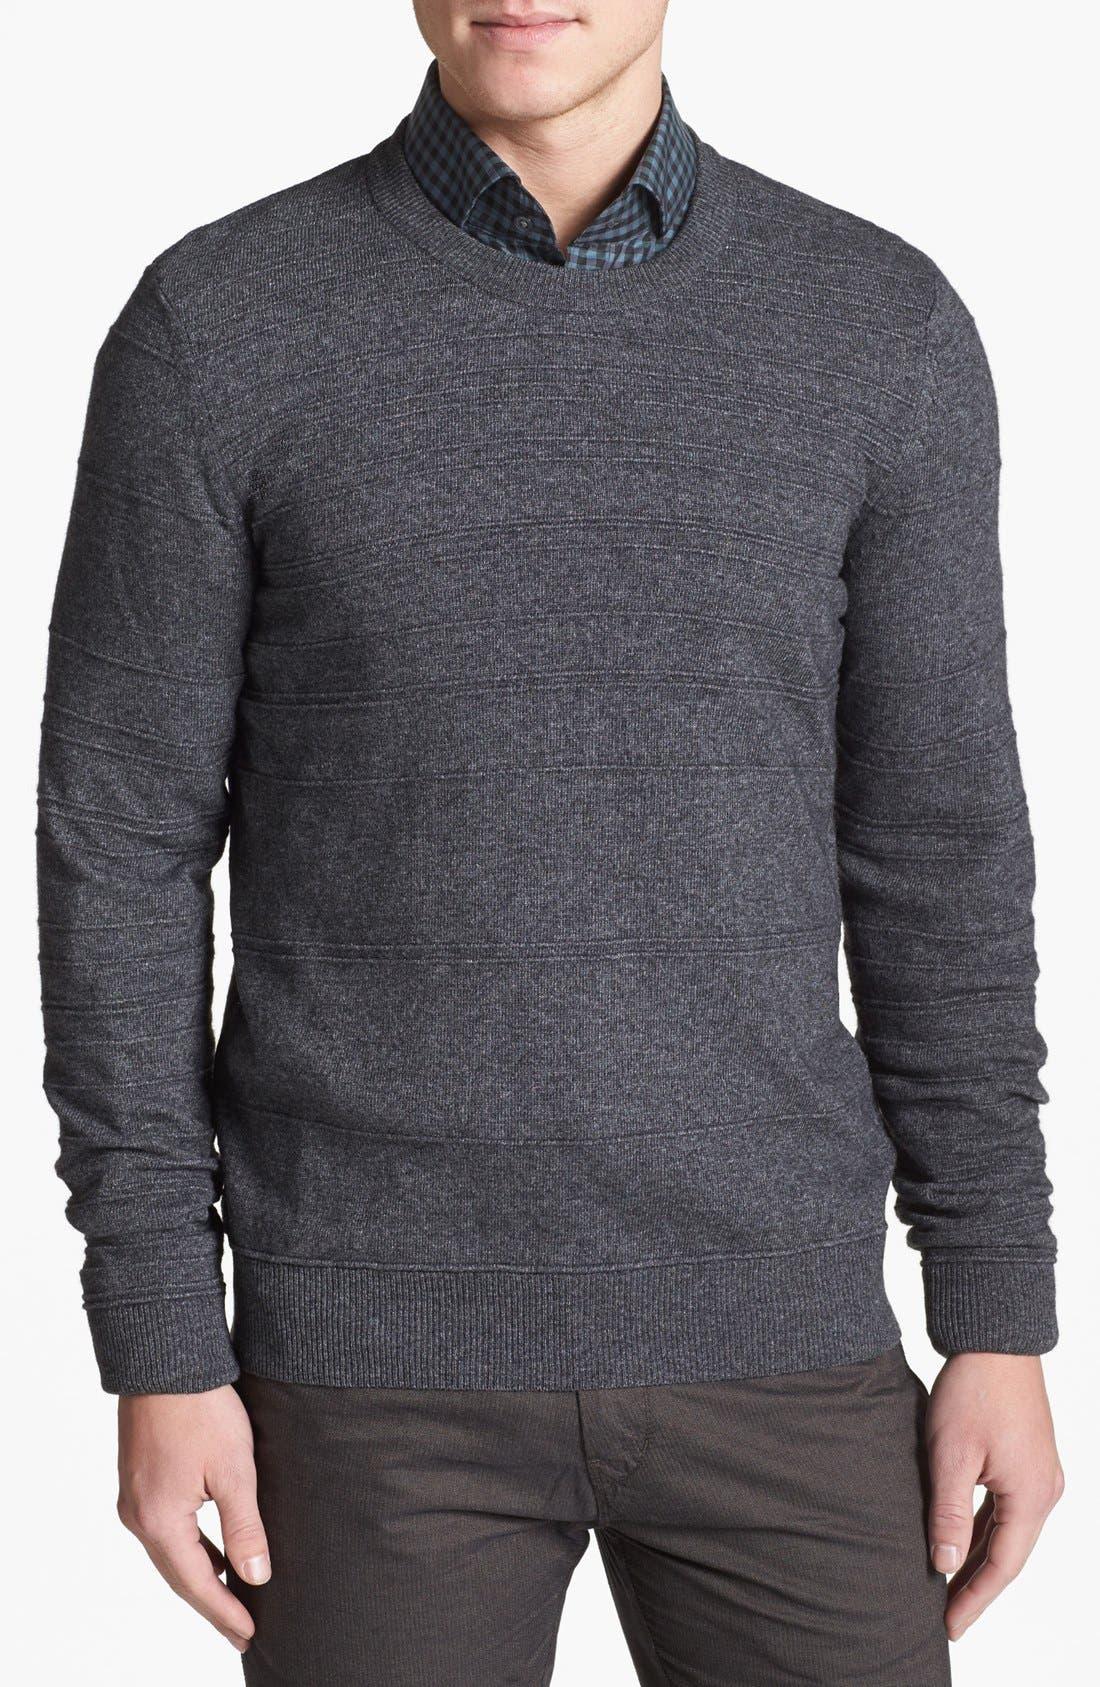 Alternate Image 1 Selected - BOSS HUGO BOSS 'Murphy' Stripe Sweater